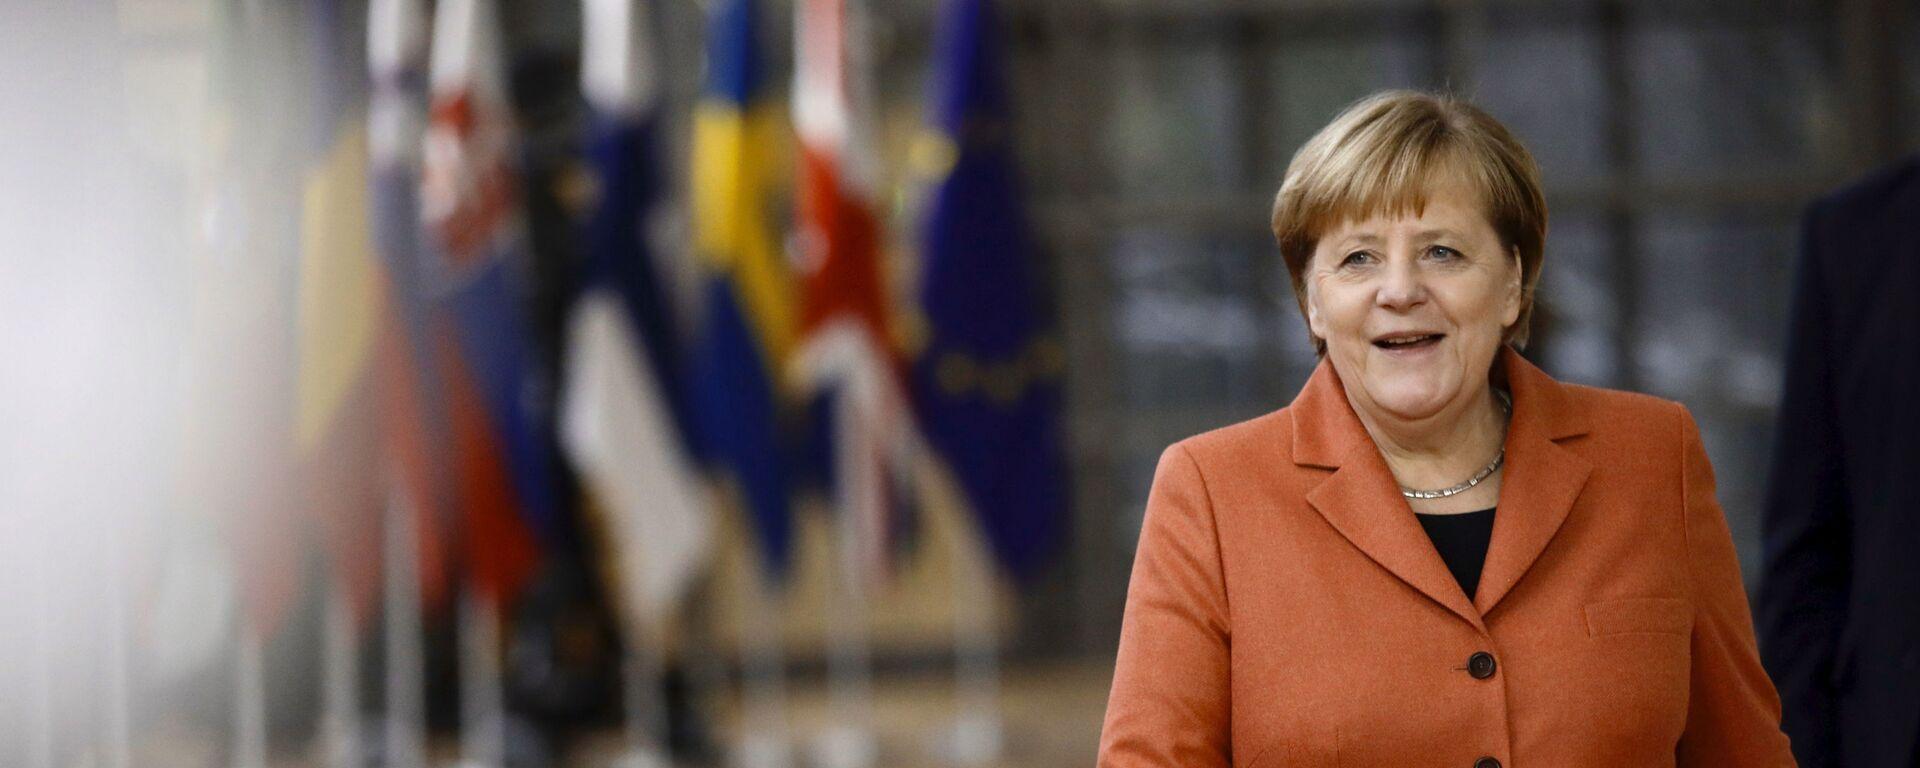 Канцлер Германии Ангела Меркель - Sputnik Таджикистан, 1920, 06.09.2021